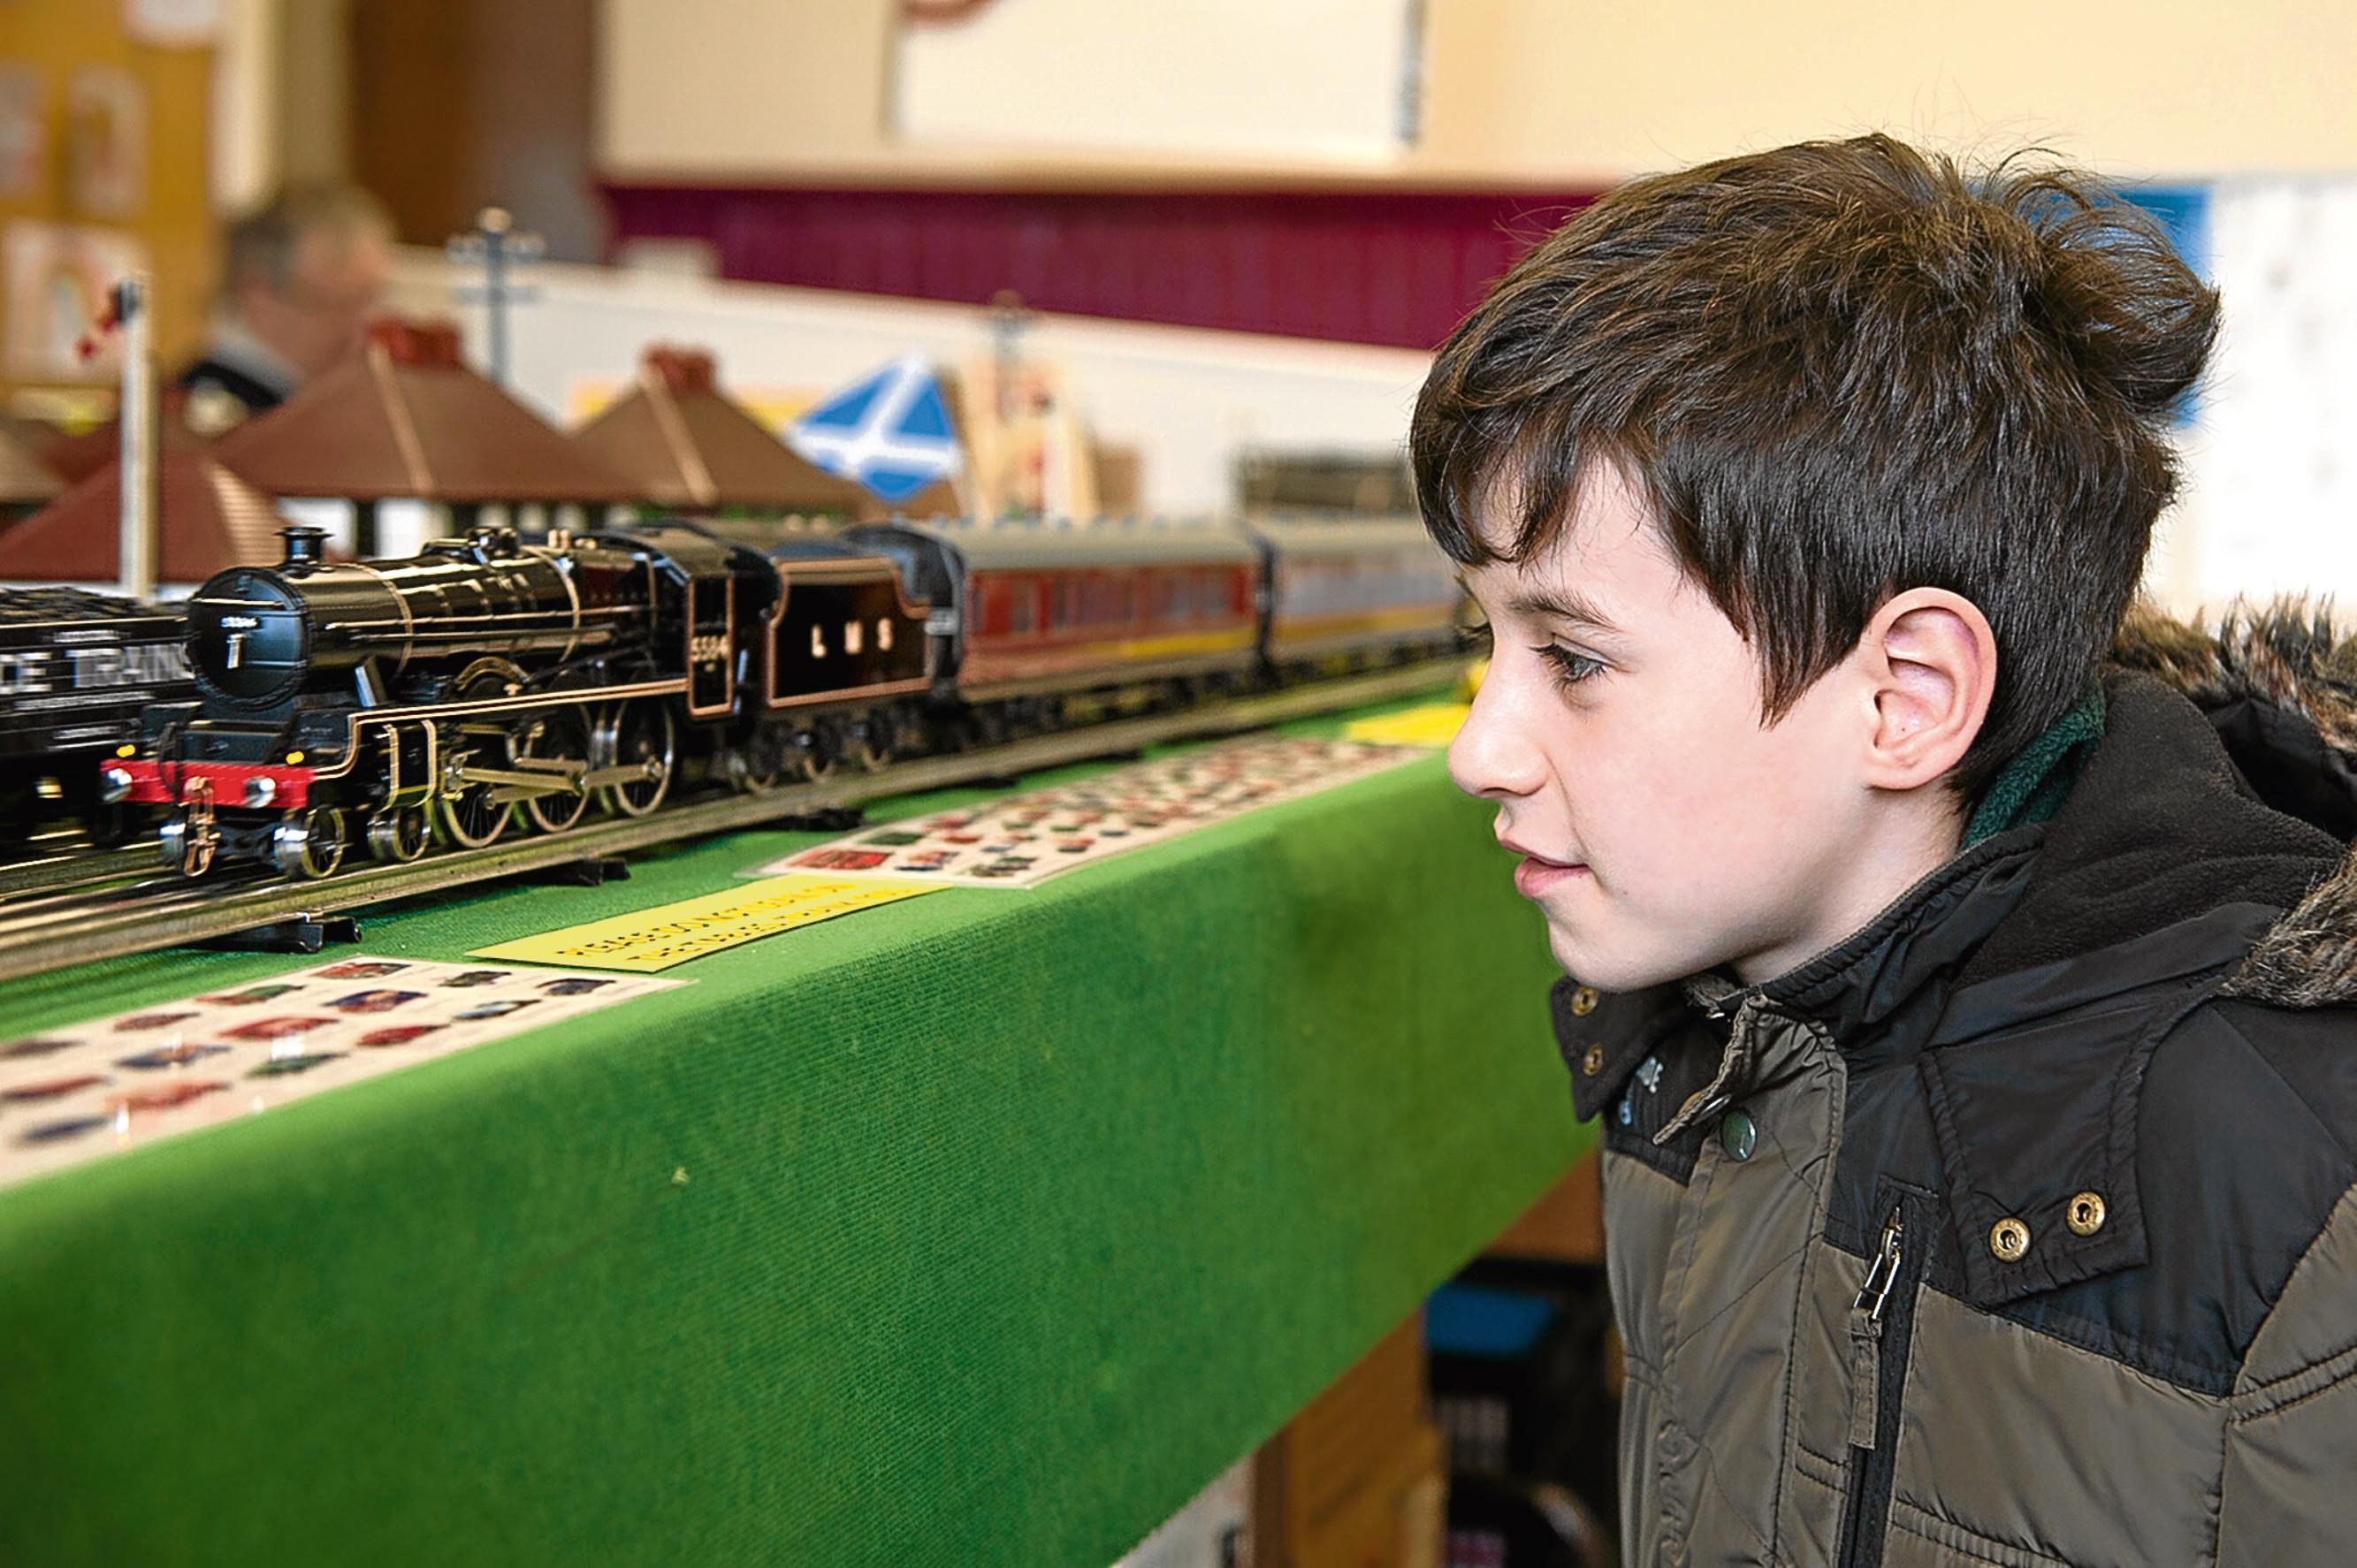 Caption (description) CR0000444,Kirriemuir Miniature railway exhibition, Picture shows, Visitor Arran Joss looking at the trains, 7th April 2018